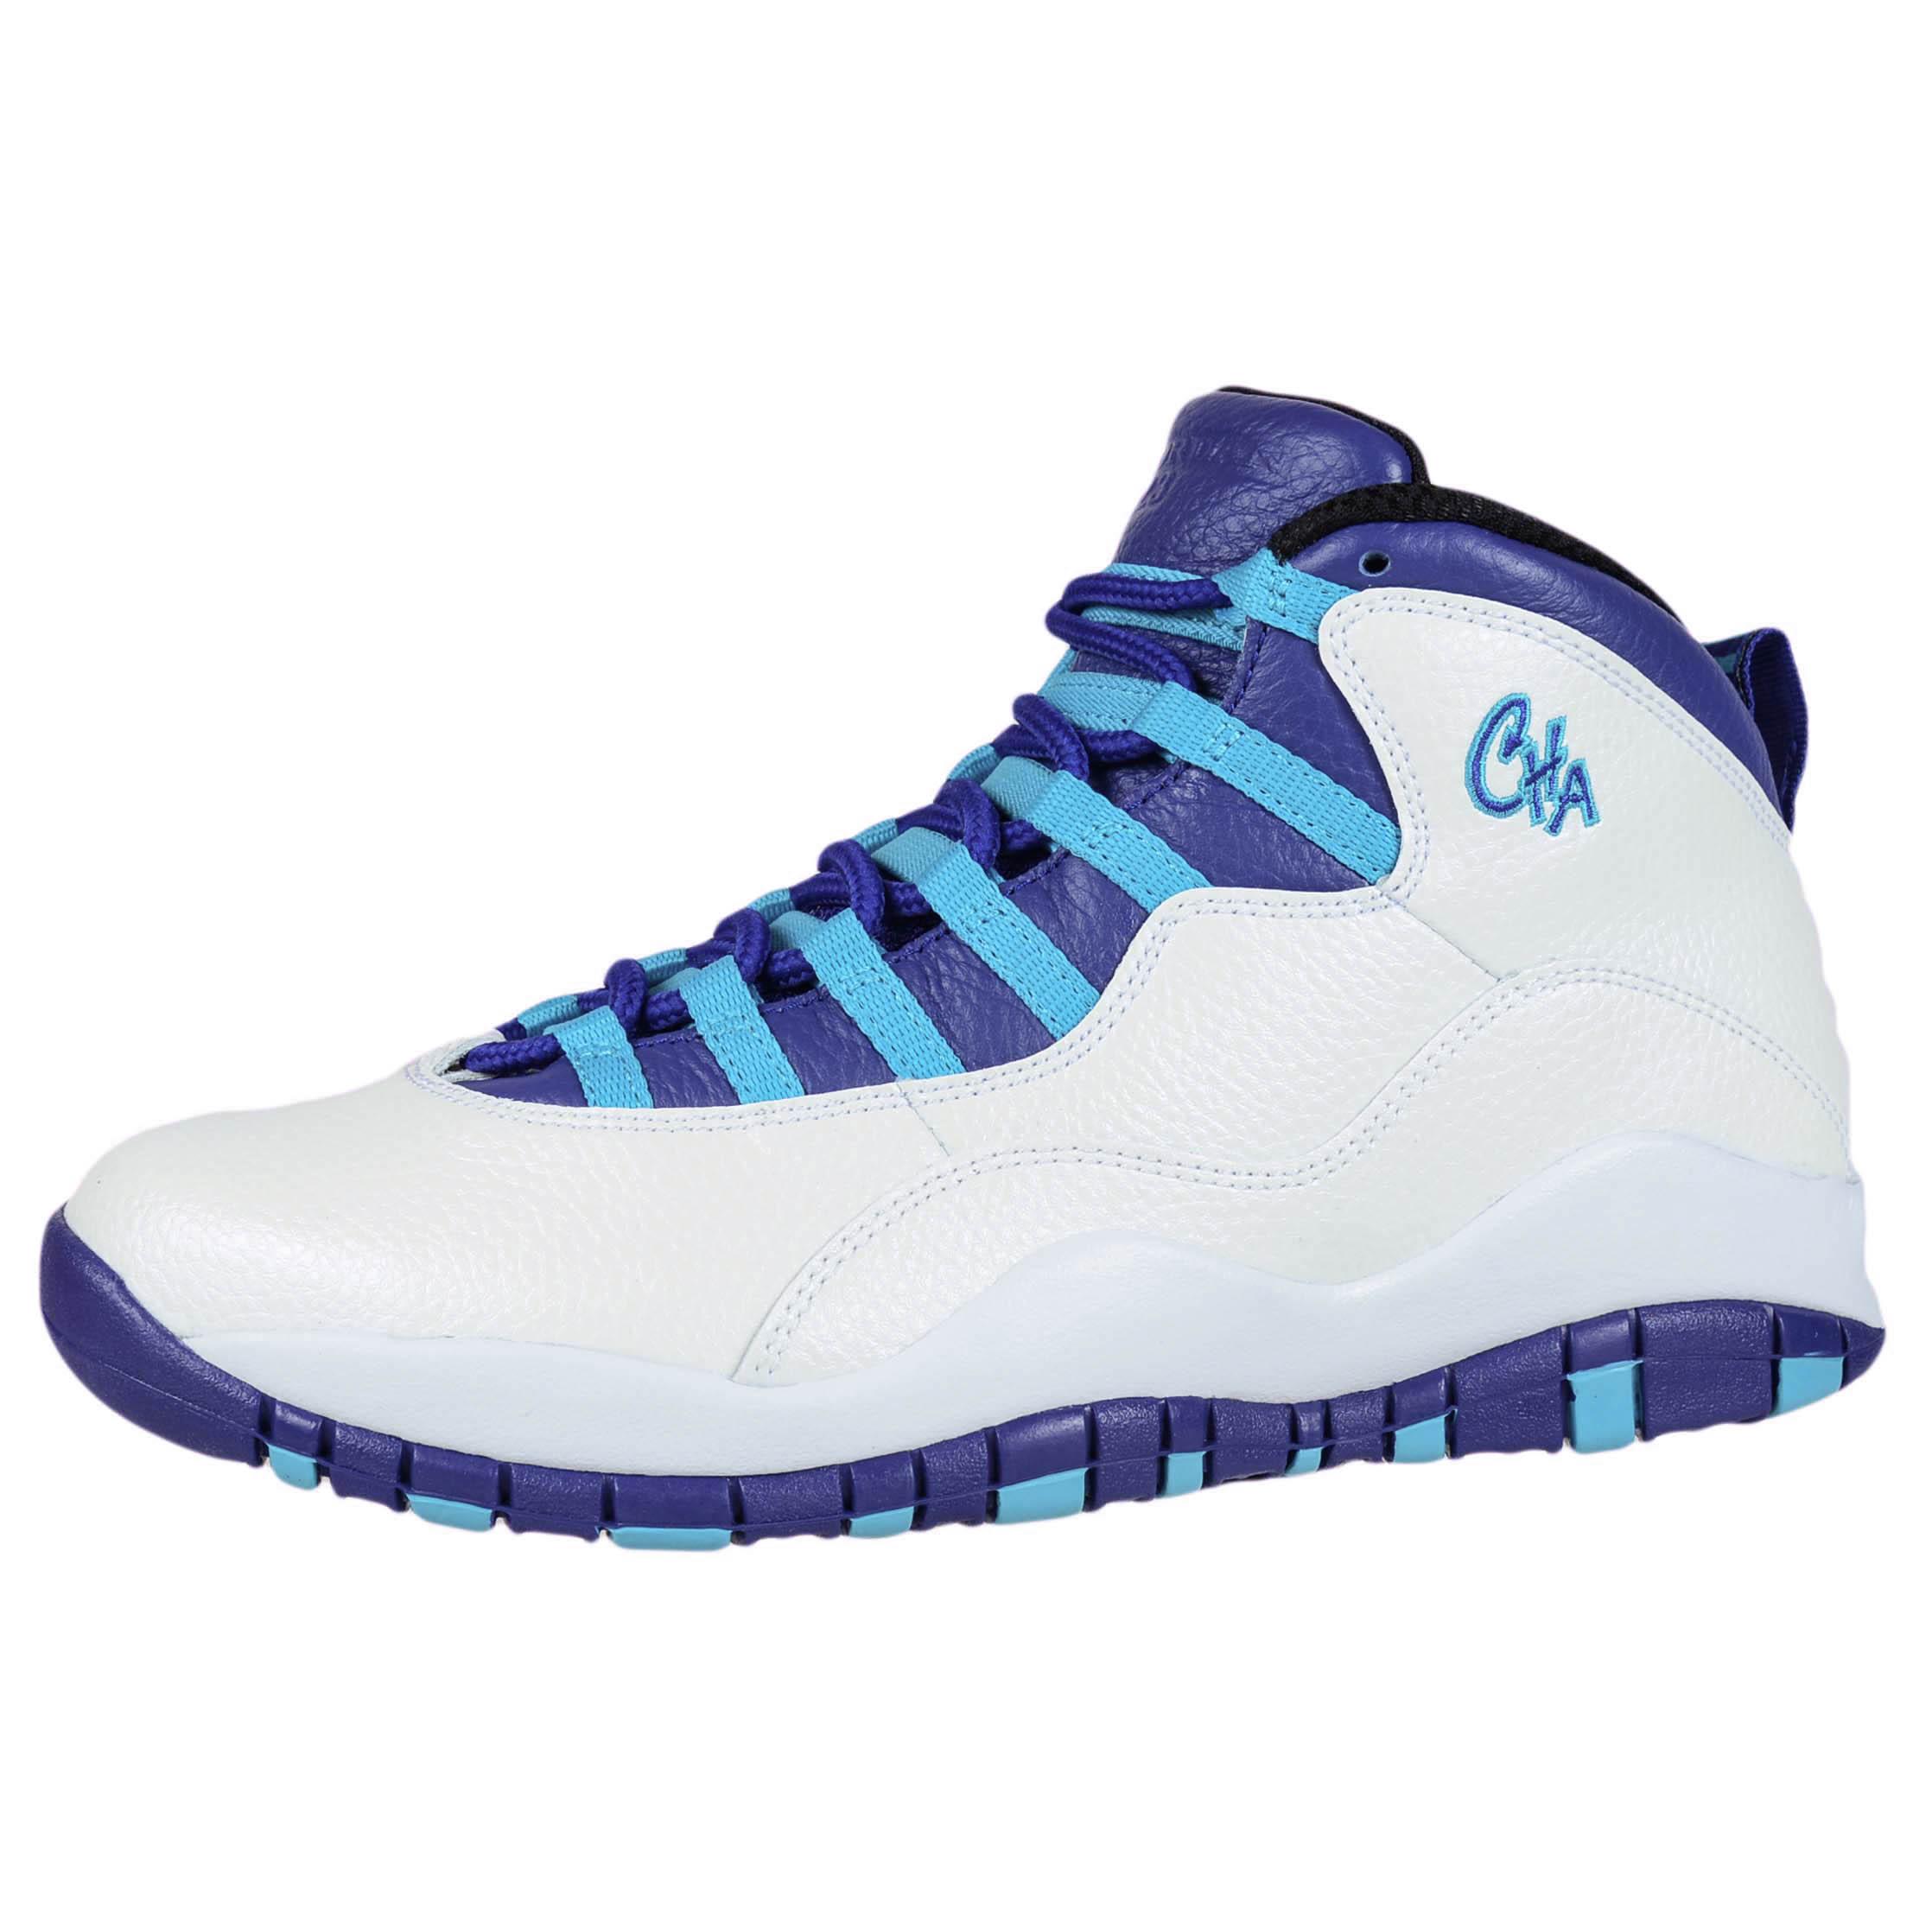 ... nike air jordan retro 10 charlotte white concord blue lagoon 310805 107  size 8